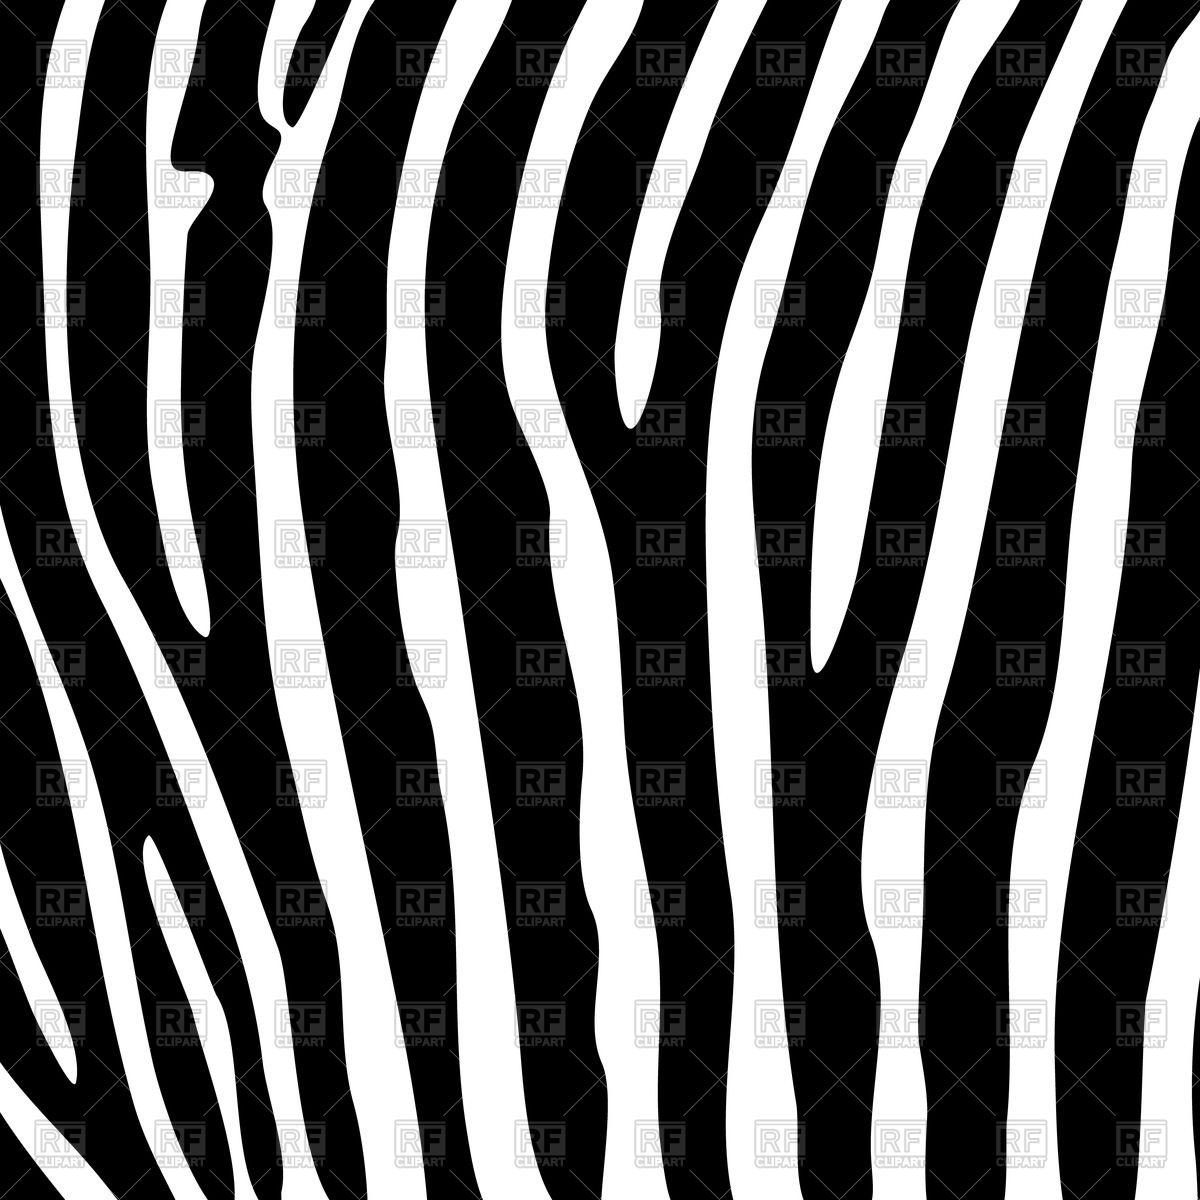 Black and white zebra striped background Stock Vector Image.